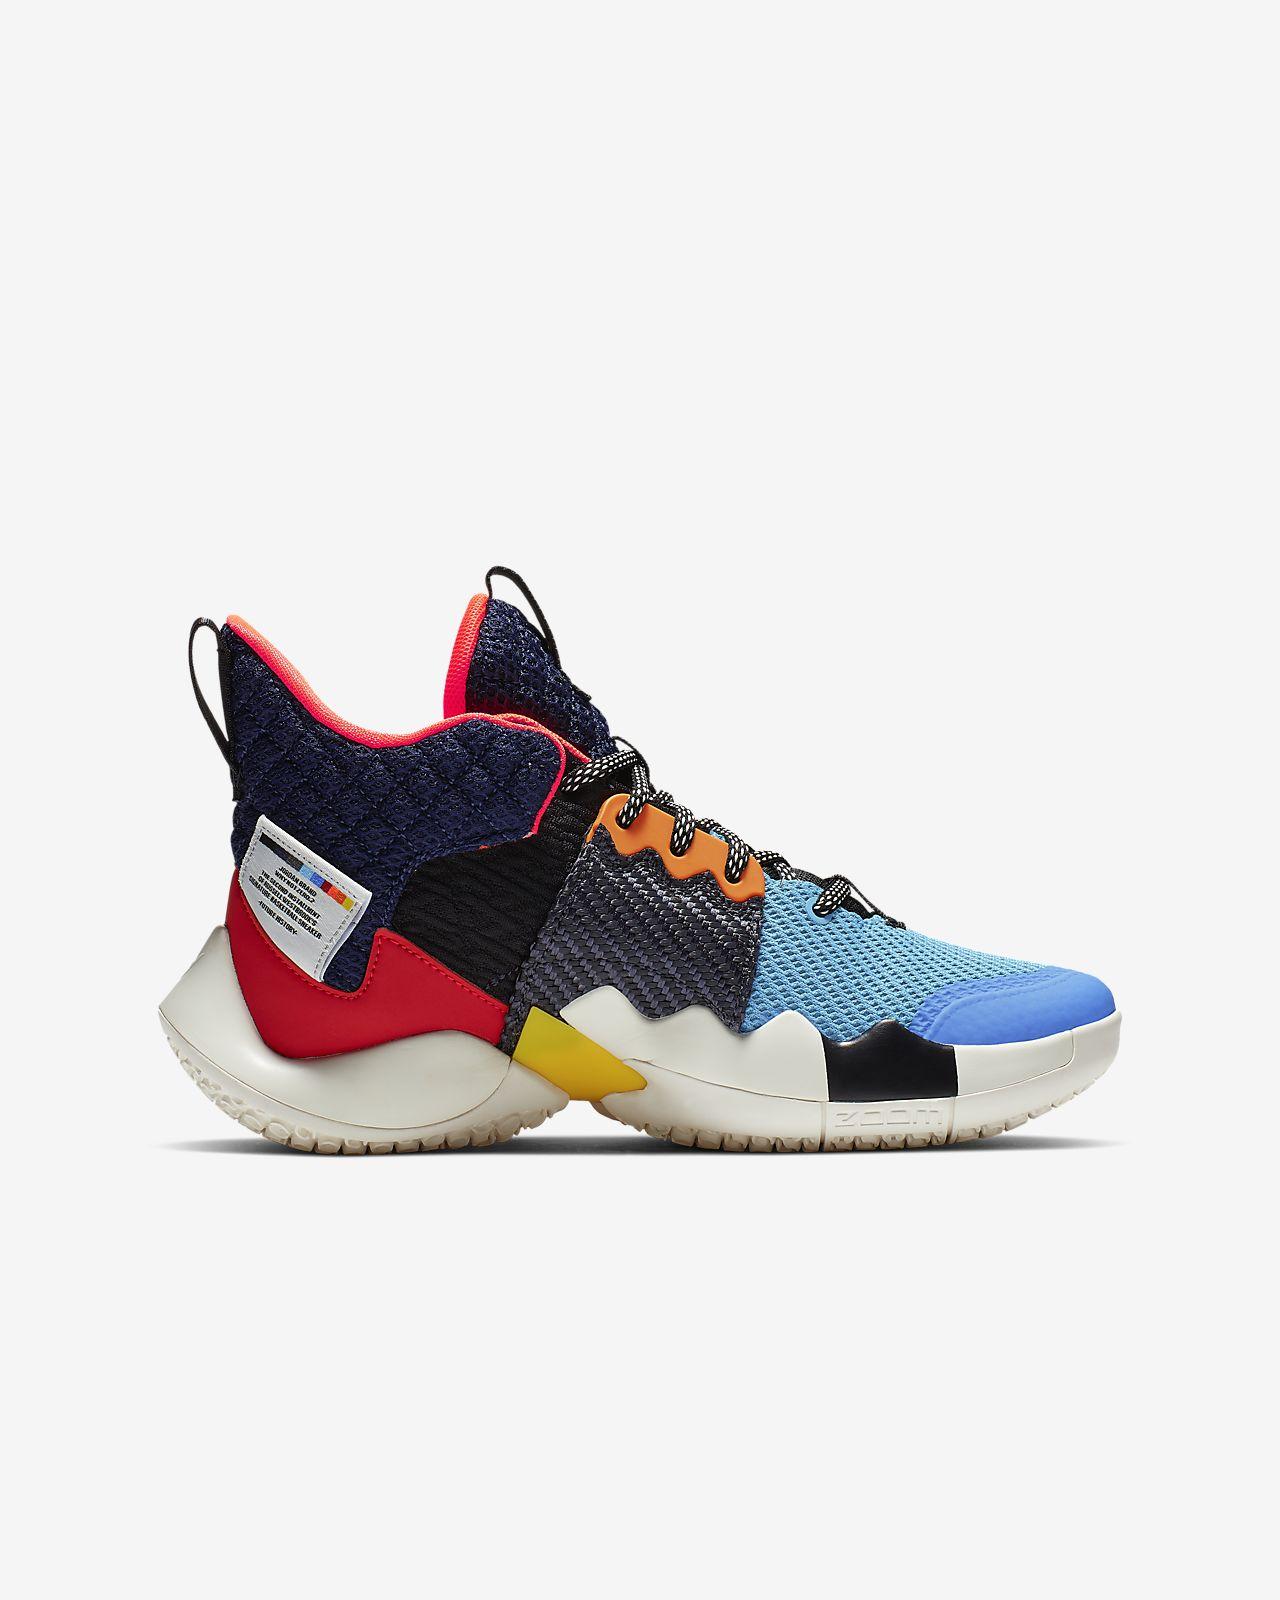 innovative design c3ba5 c0b74 ... Jordan  Why Not   Zer0.2 Older Kids  Basketball Shoe